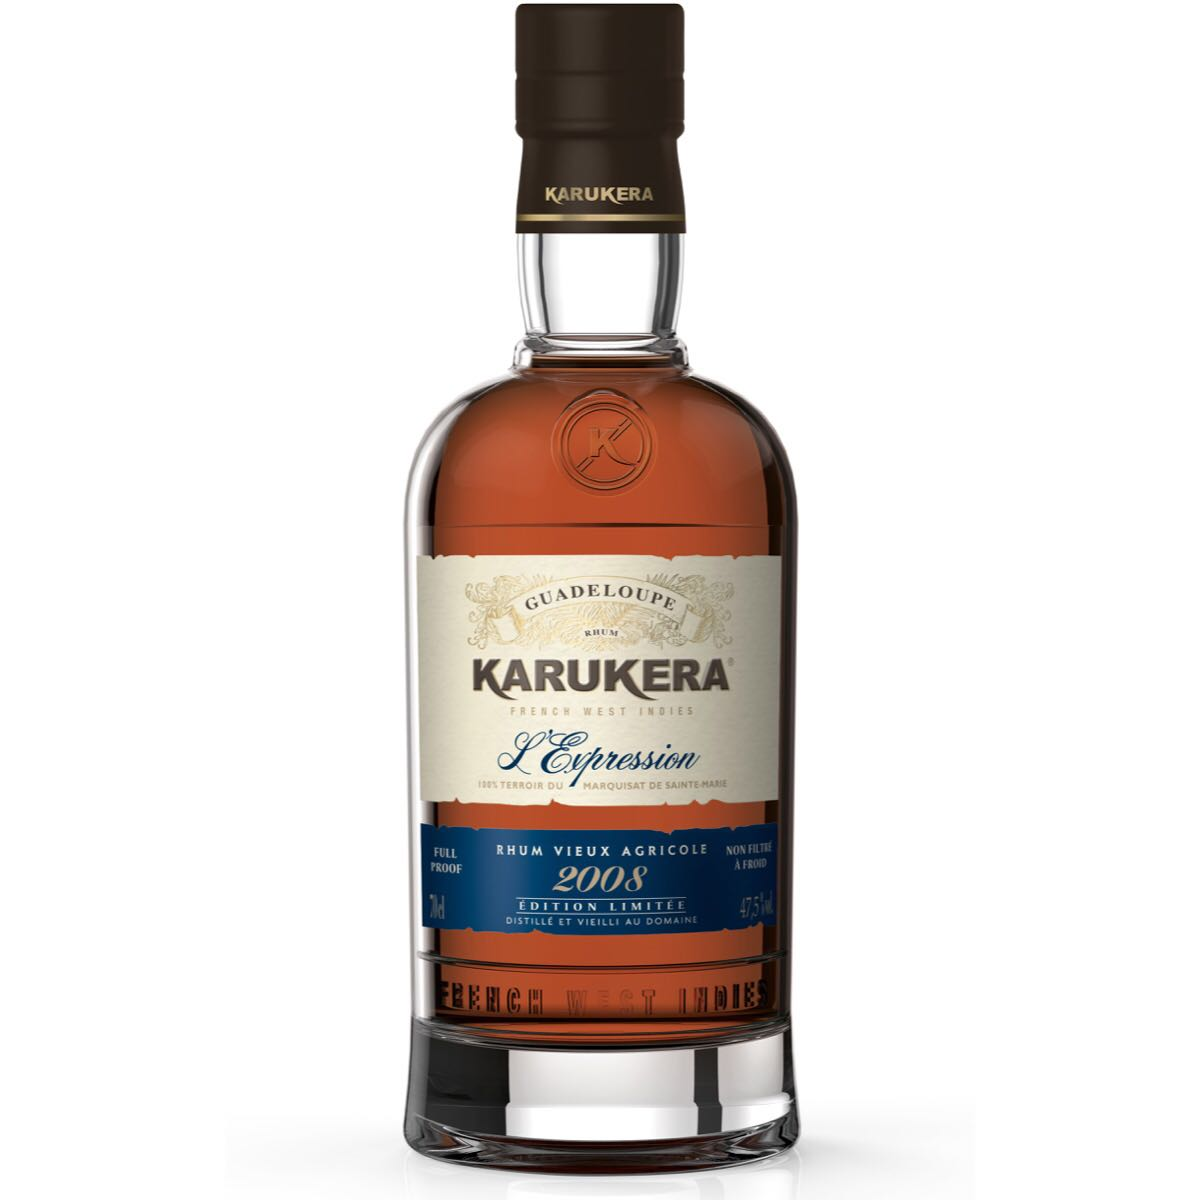 Bottle image of Karukera Millésime L'Expression